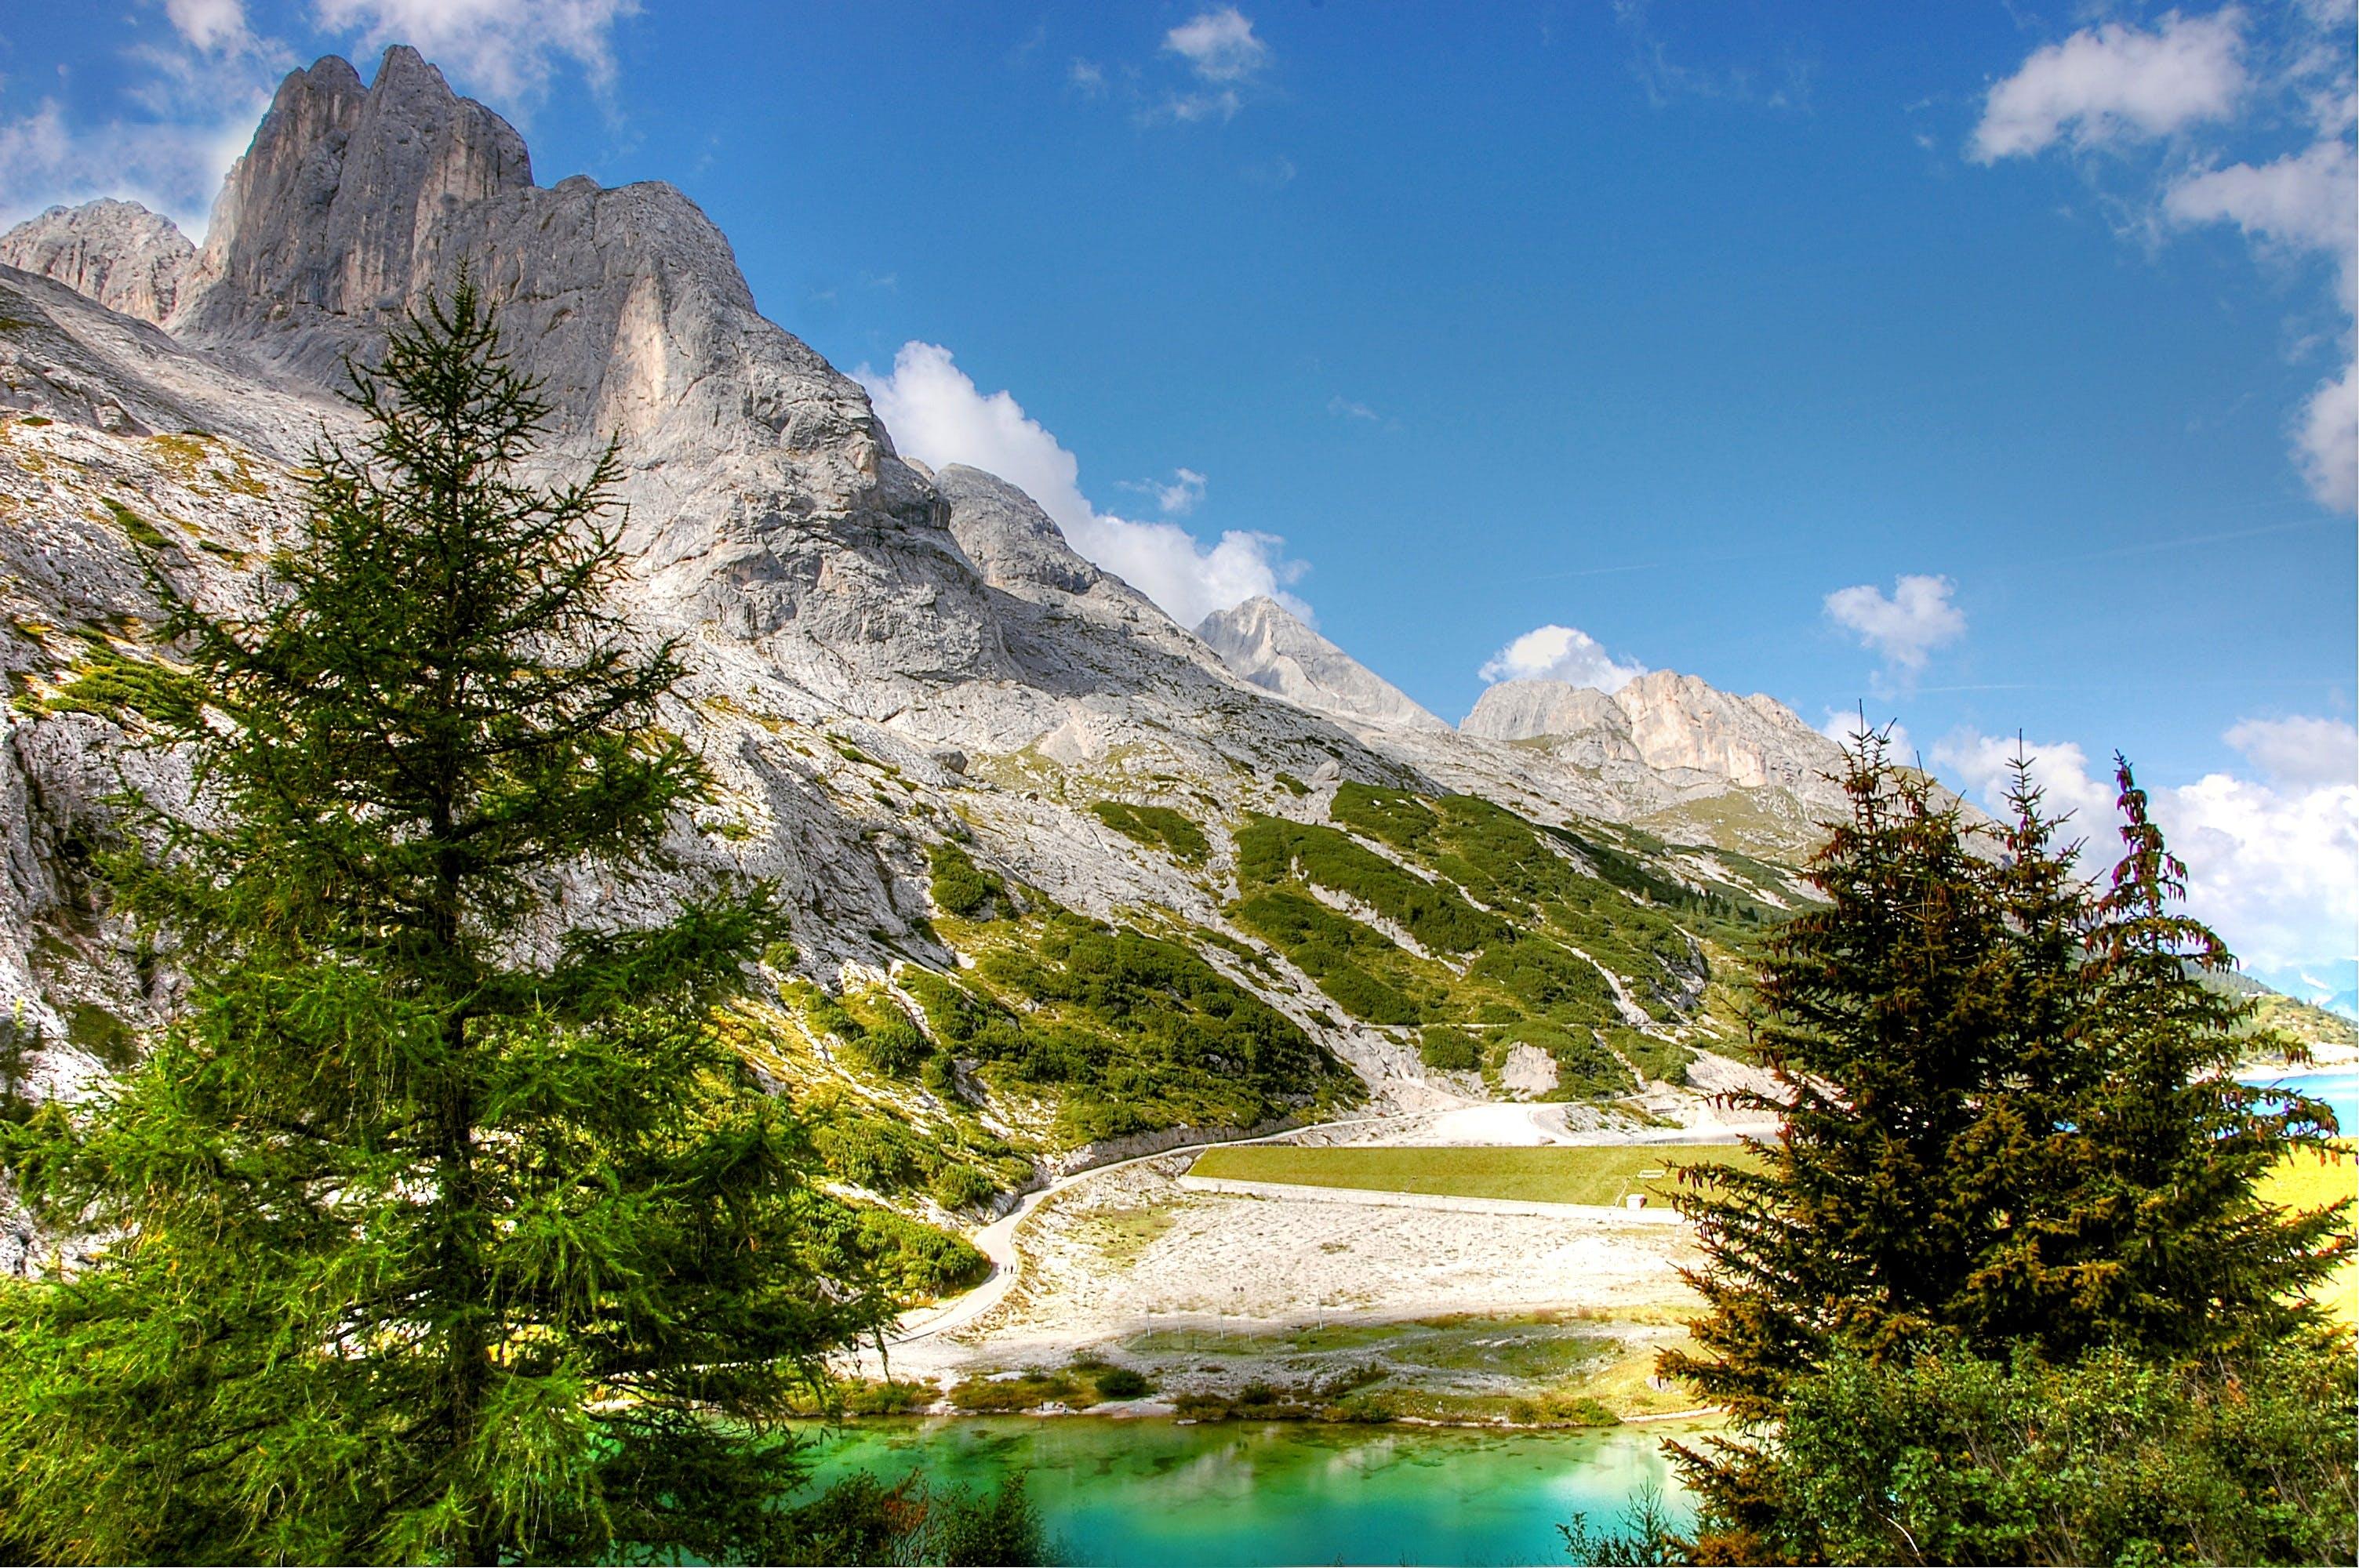 Kostenloses Stock Foto zu alpin, bäume, berge, bergwandern